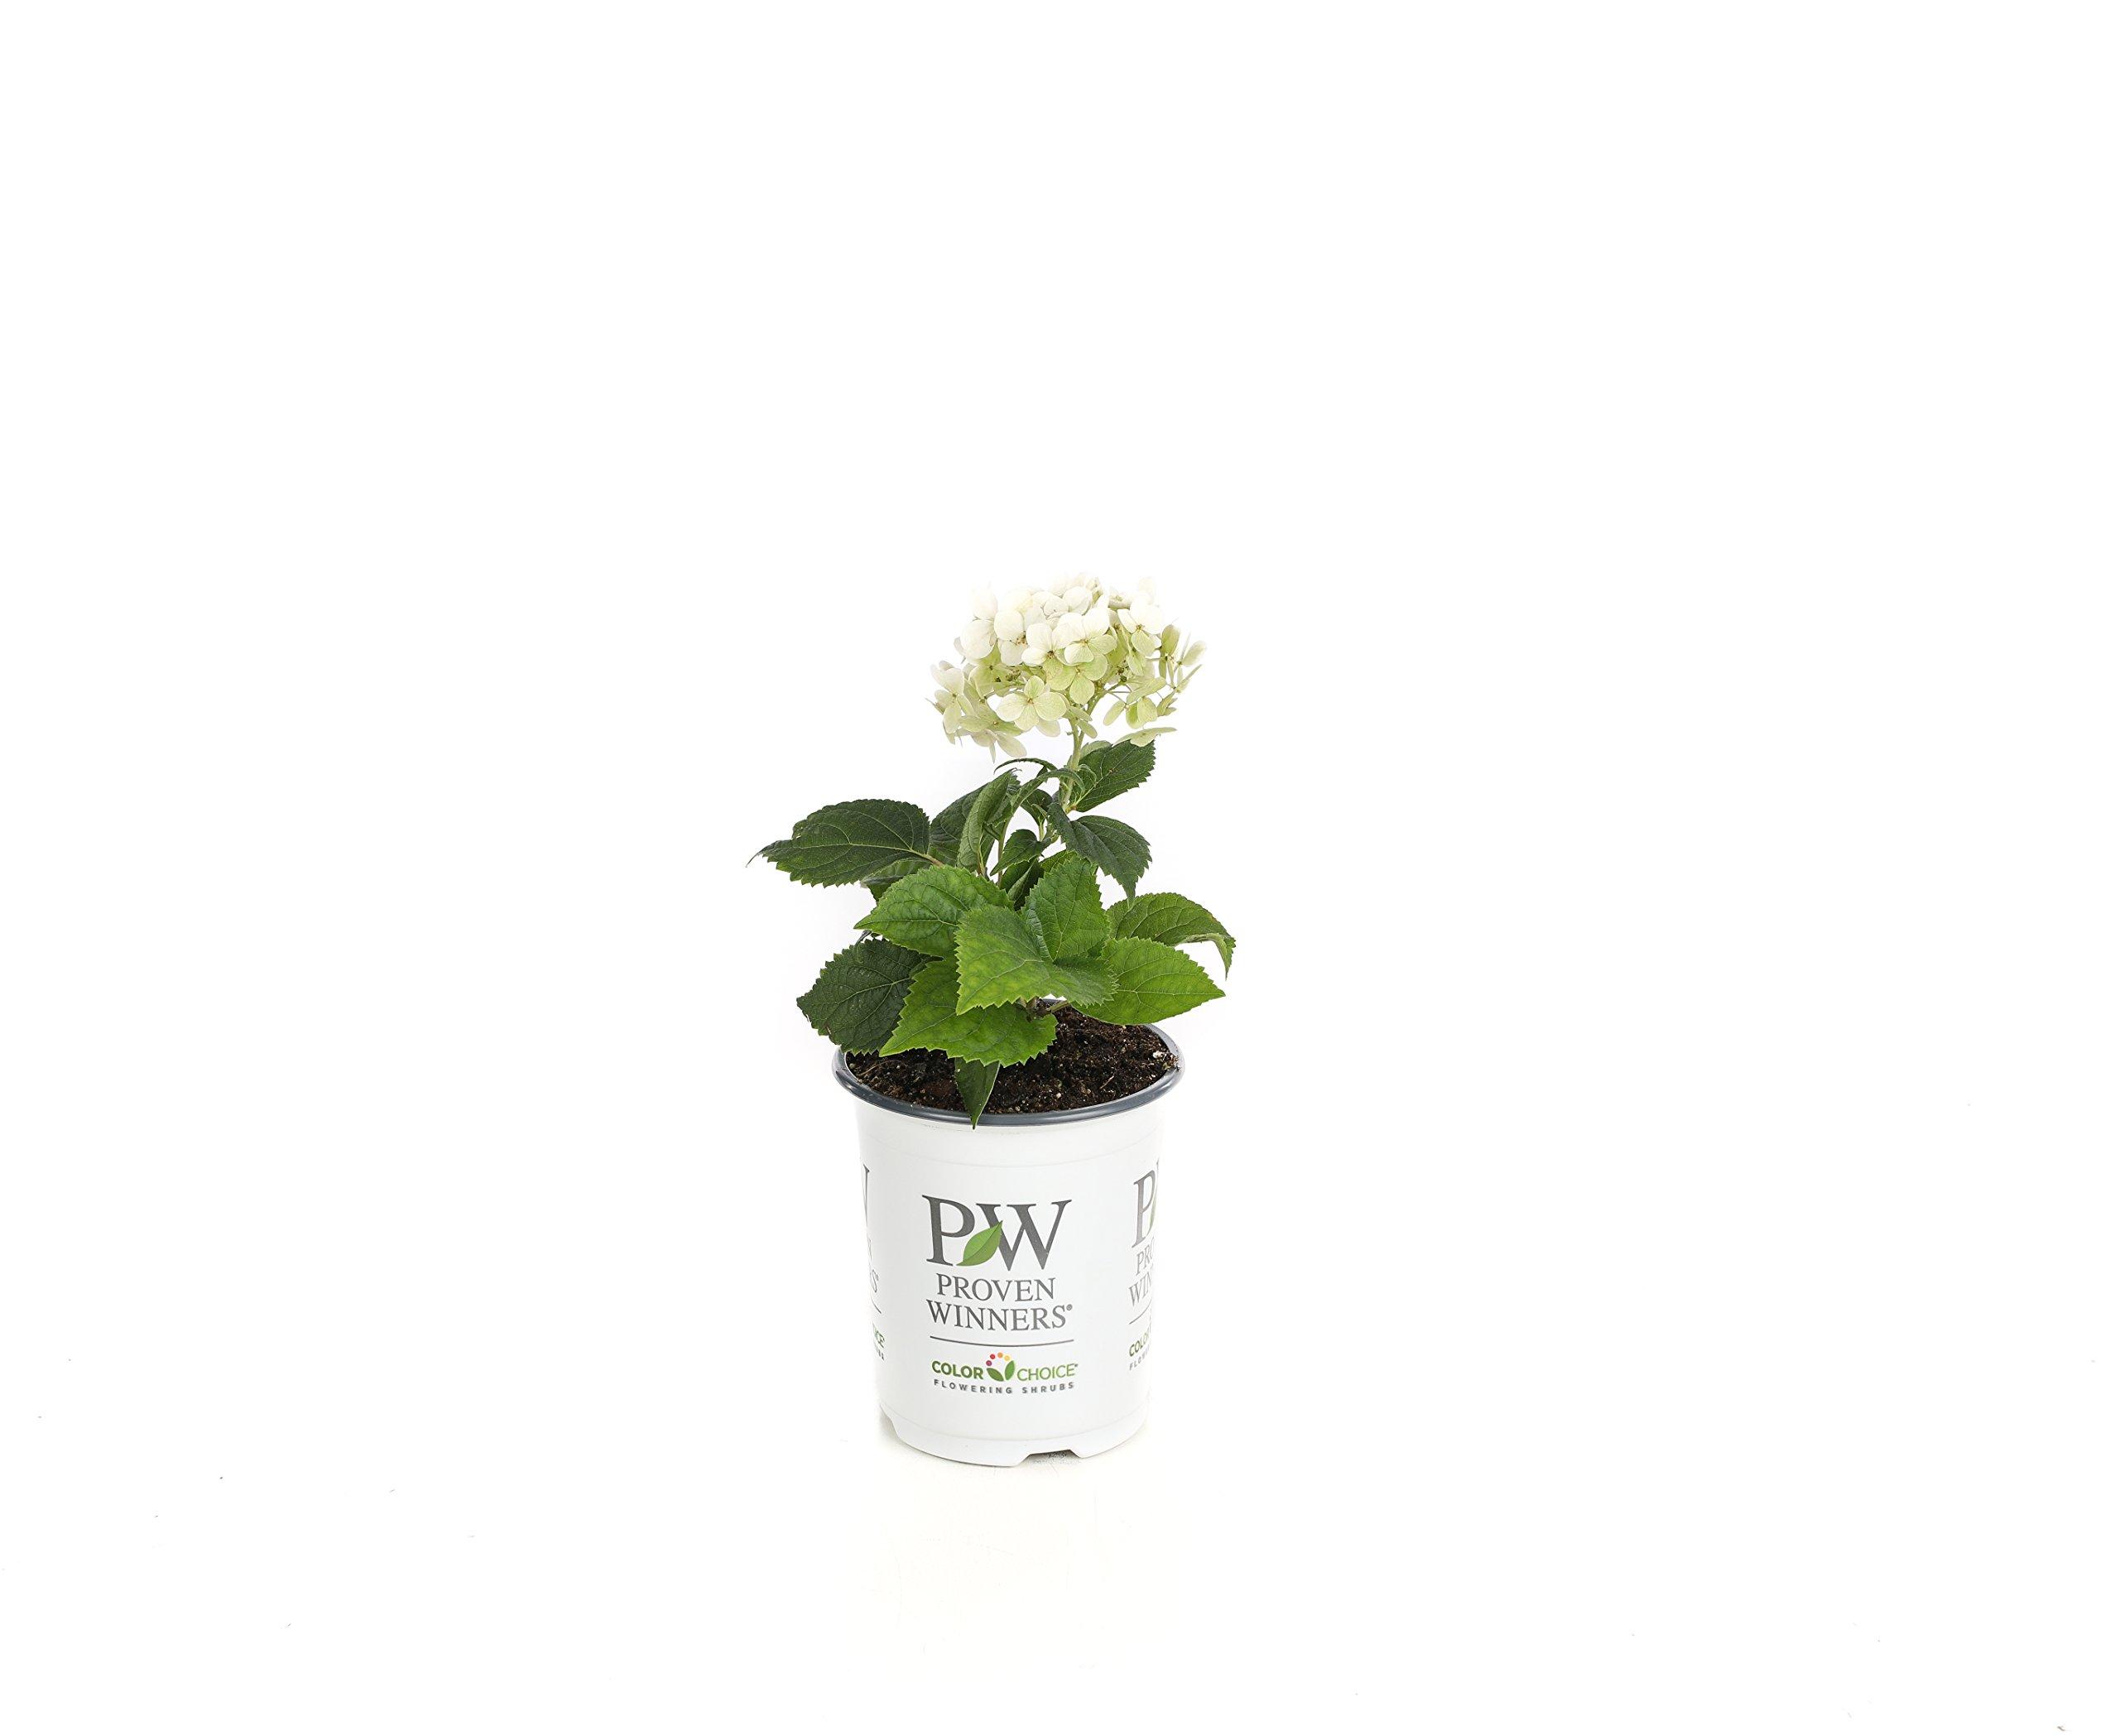 Incrediball Blush Smooth Hydrangea, Live Shrub, Light Pink Flowers, 4.5 in. Quart